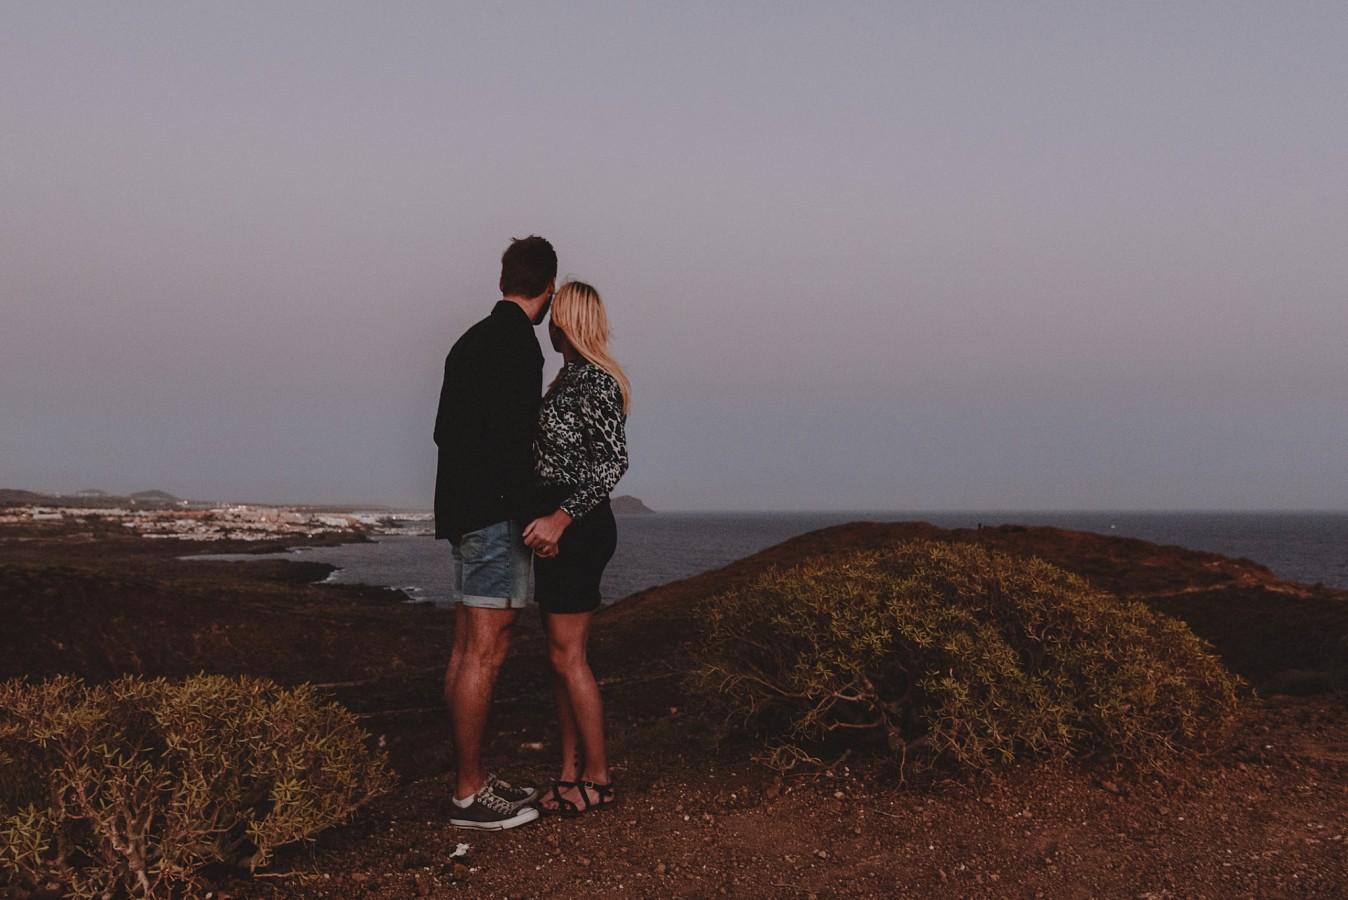 engagment-photo-shoot-tenerife-gran-canaria-photography-wedding-3708